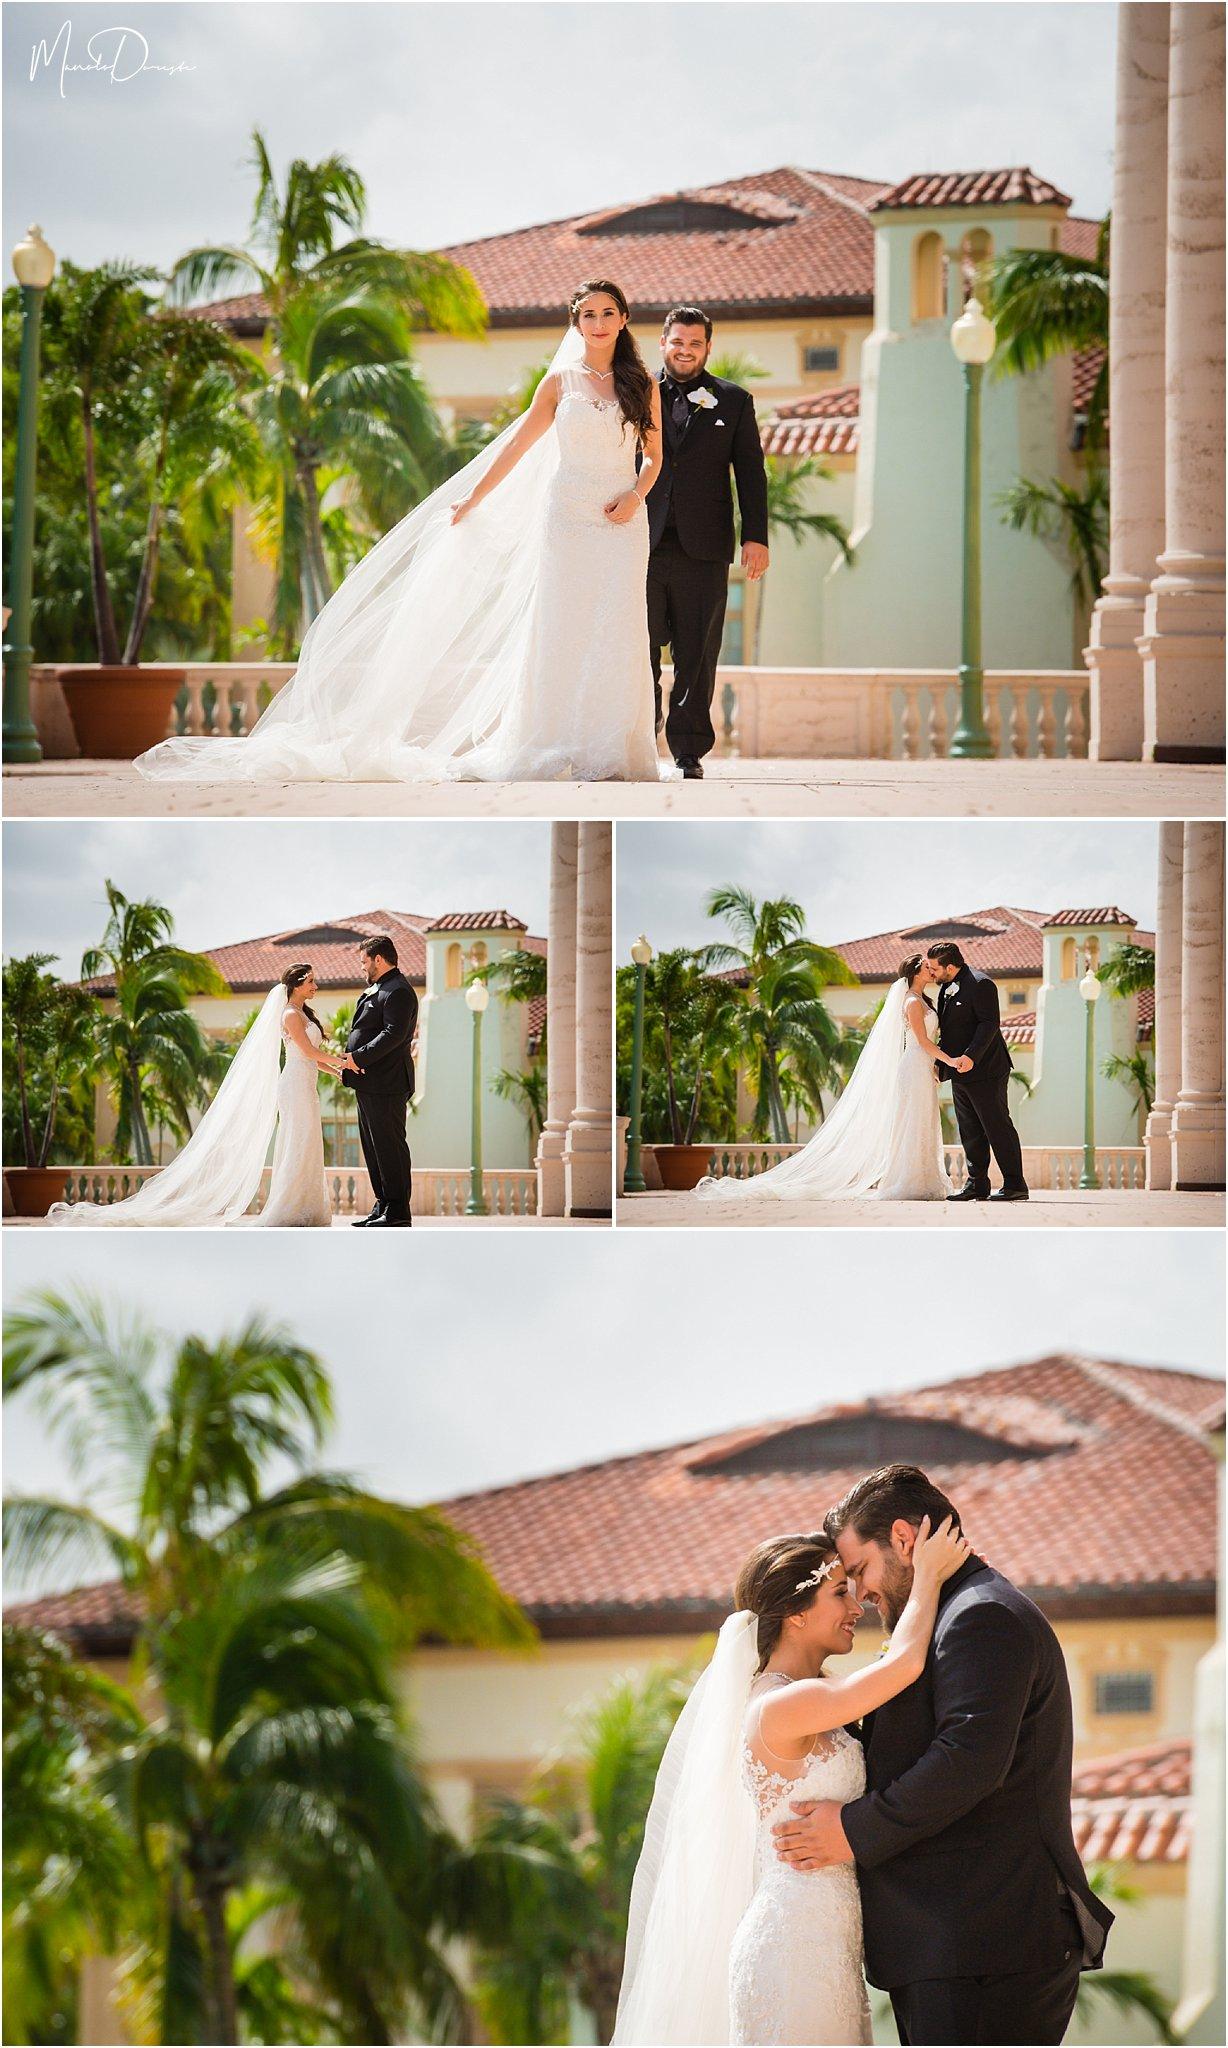 0159_ManoloDoreste_InFocusStudios_Wedding_Family_Photography_Miami_MiamiPhotographer.jpg